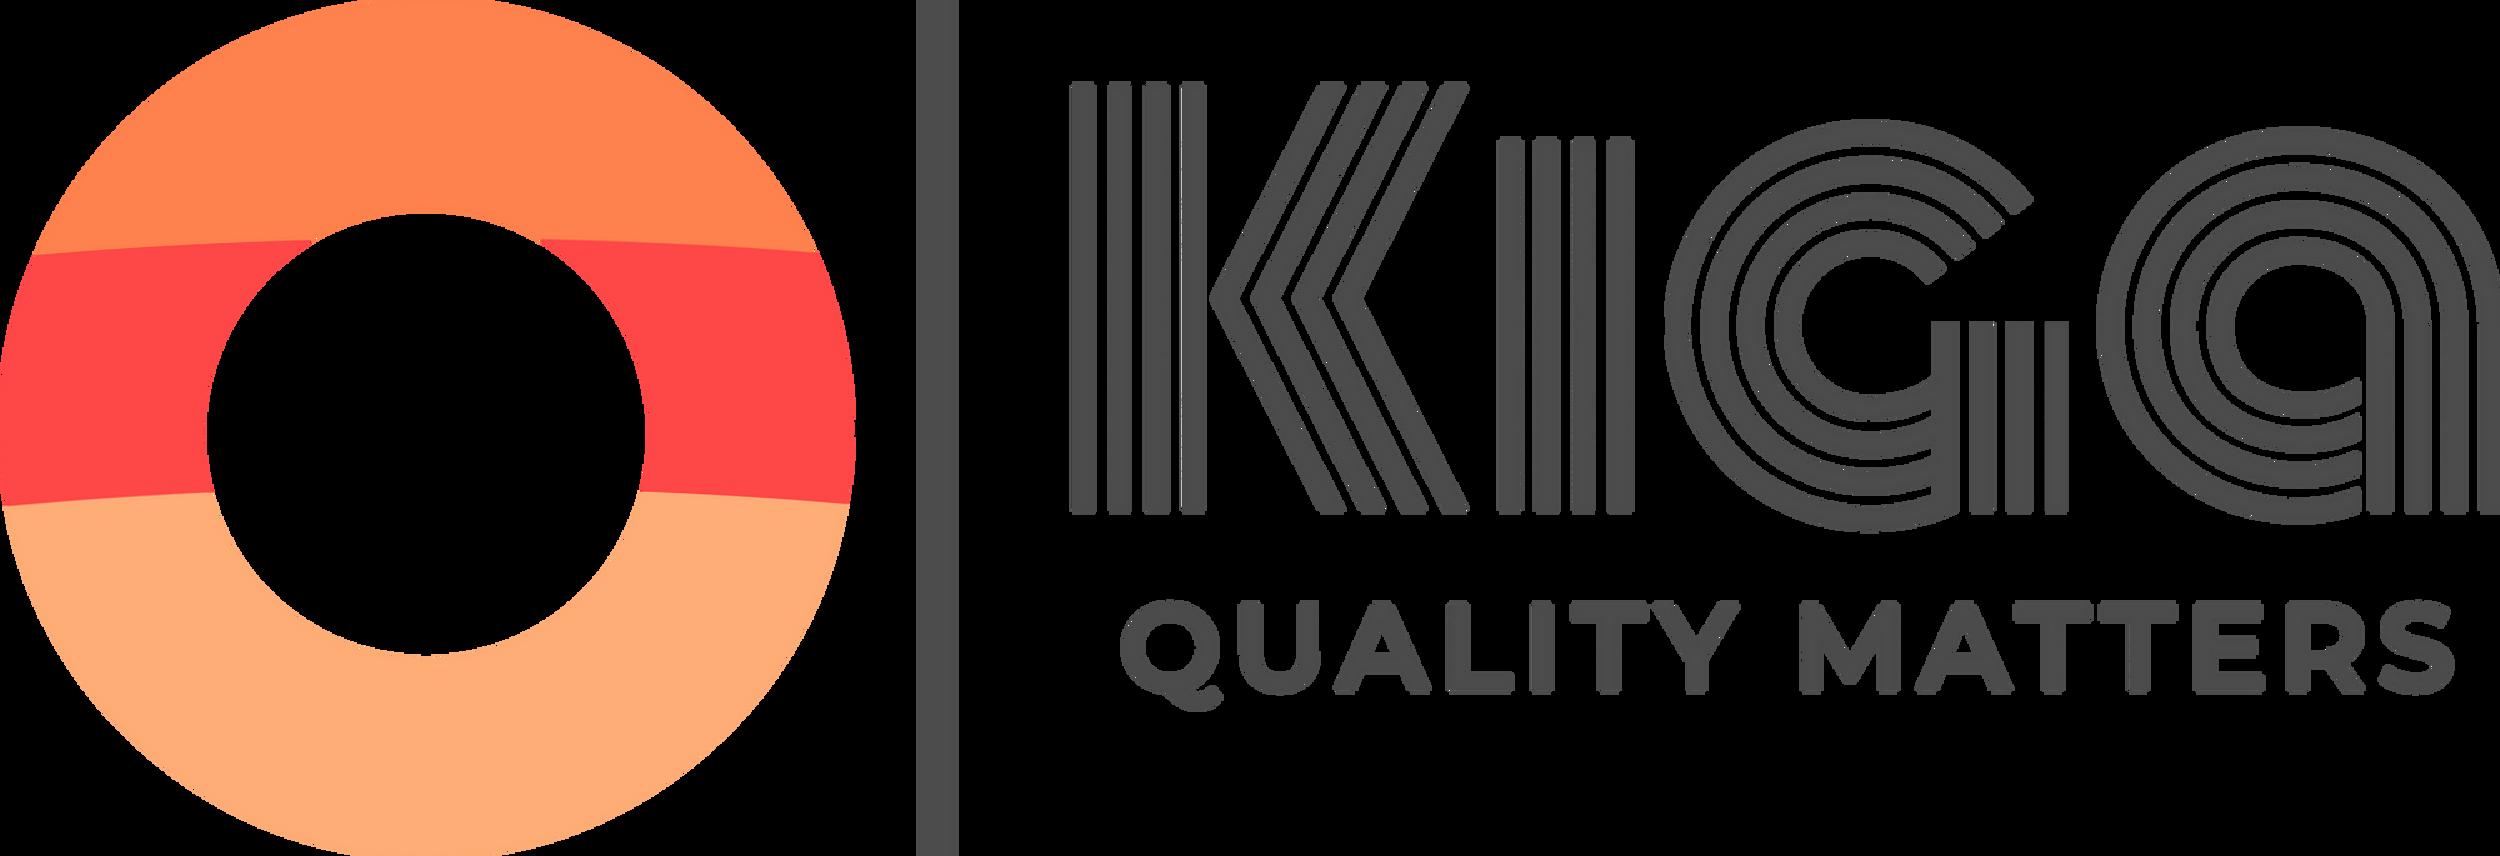 Kiga Driving School logo